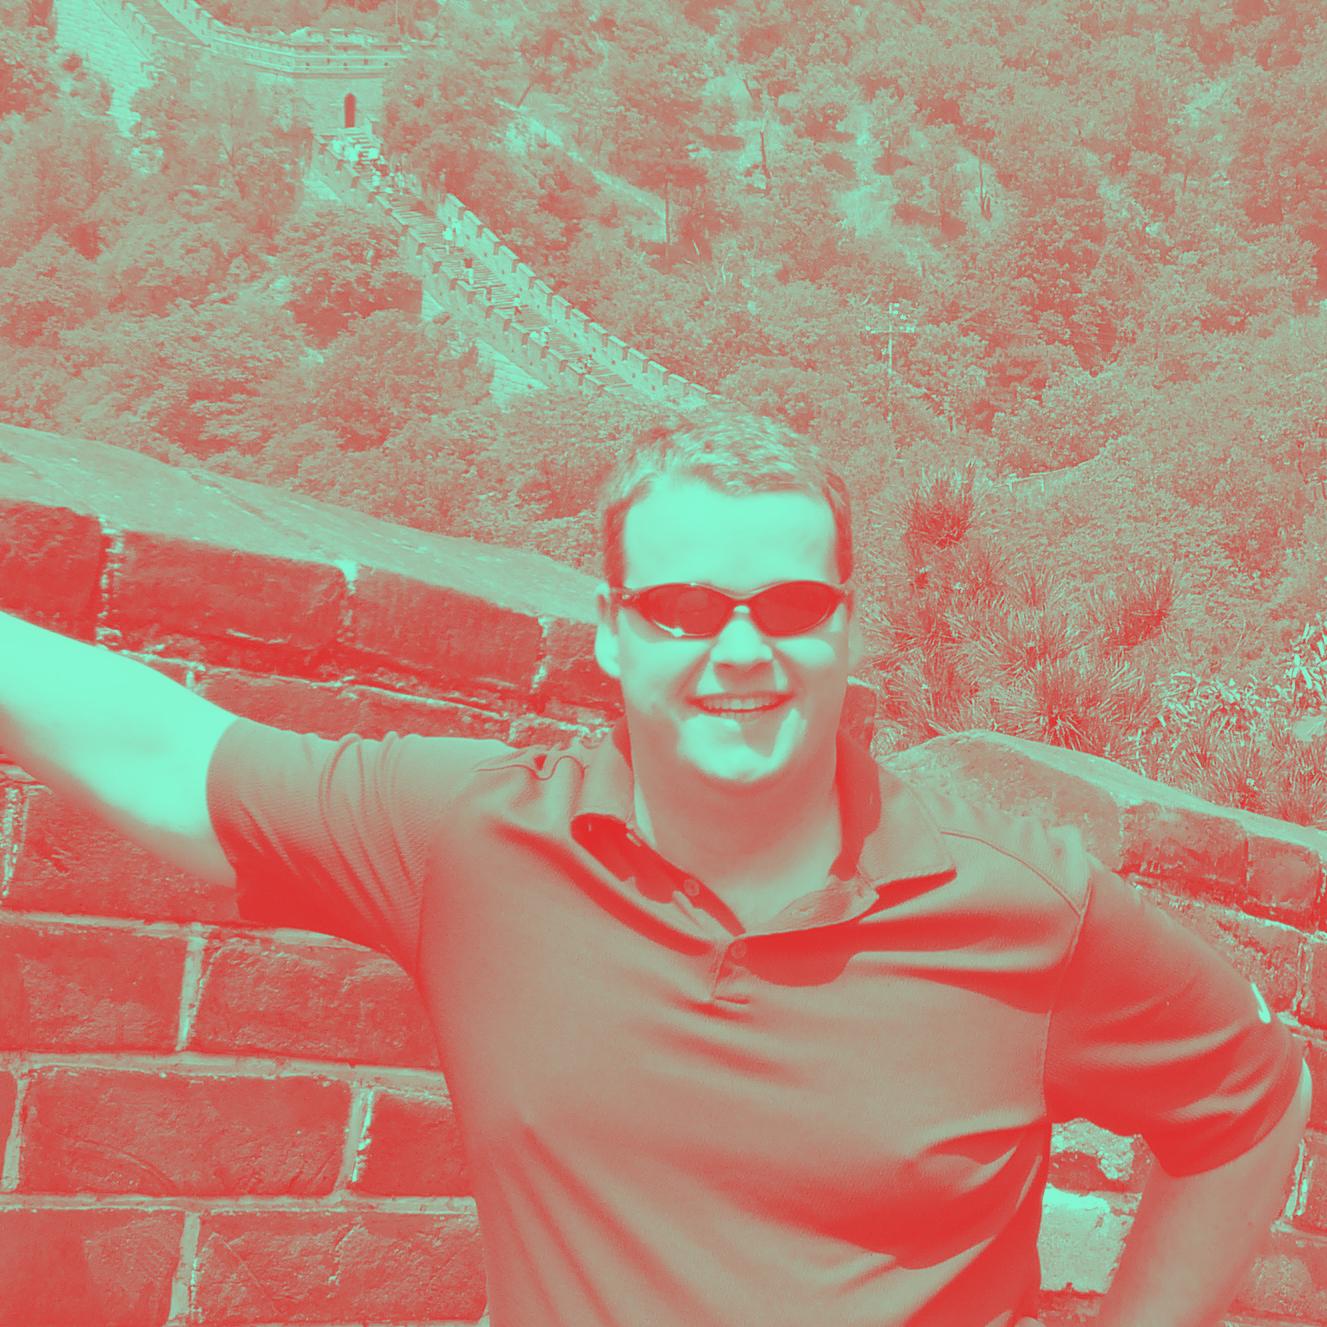 David A. Gibson -Director of Operations - LinkedIn